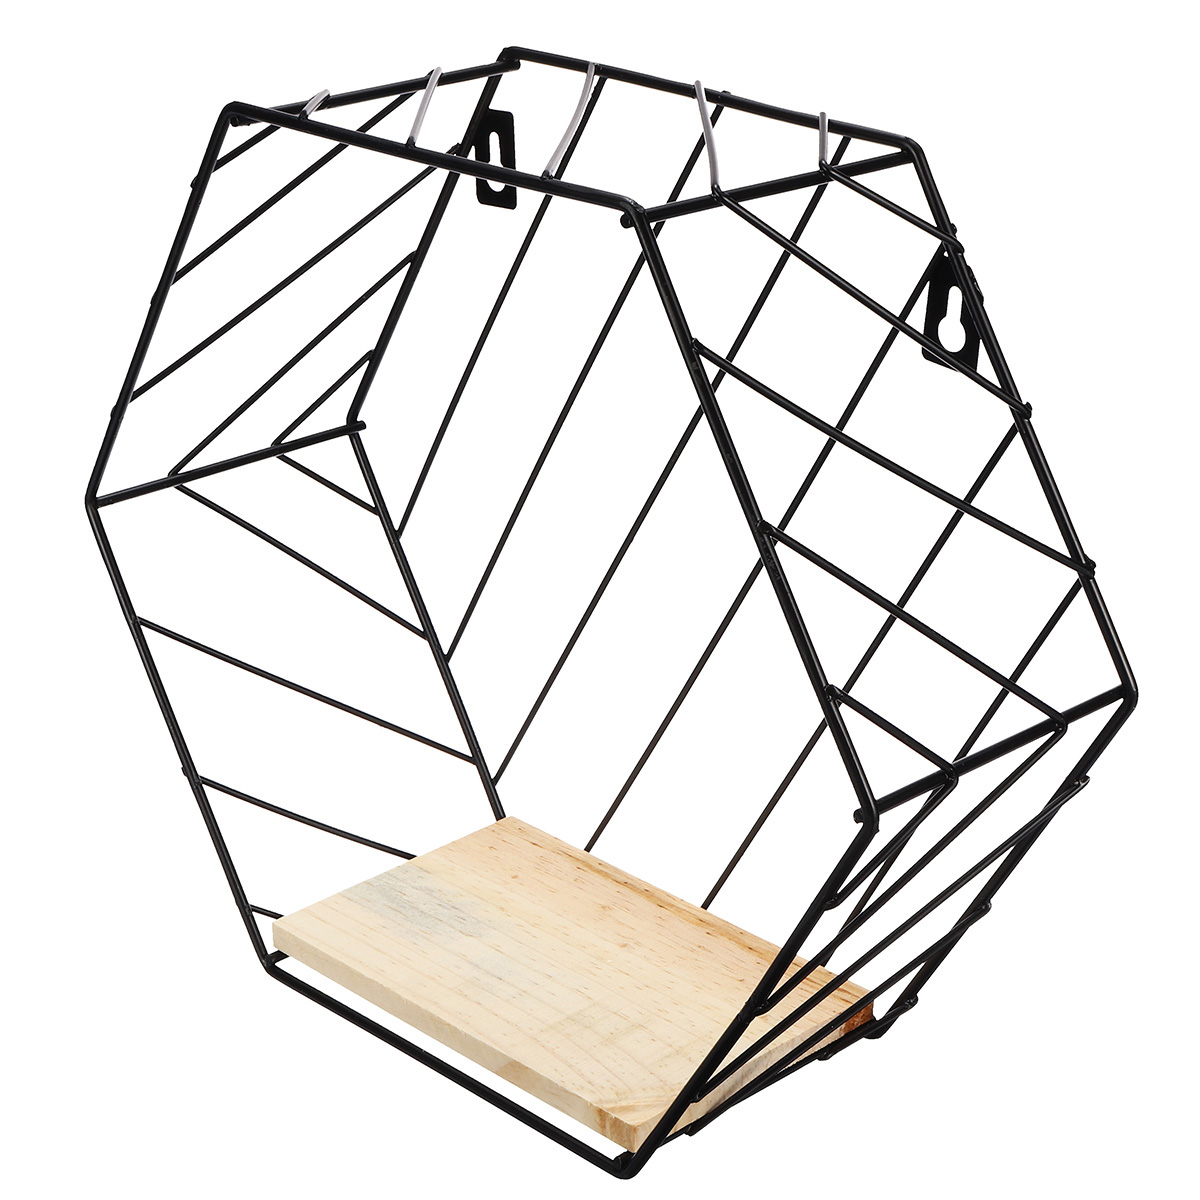 Iron-Metal-Wire-Wood-Wall-Shelf-Display-Stand-Storage-Rack-Home-Office-Decor